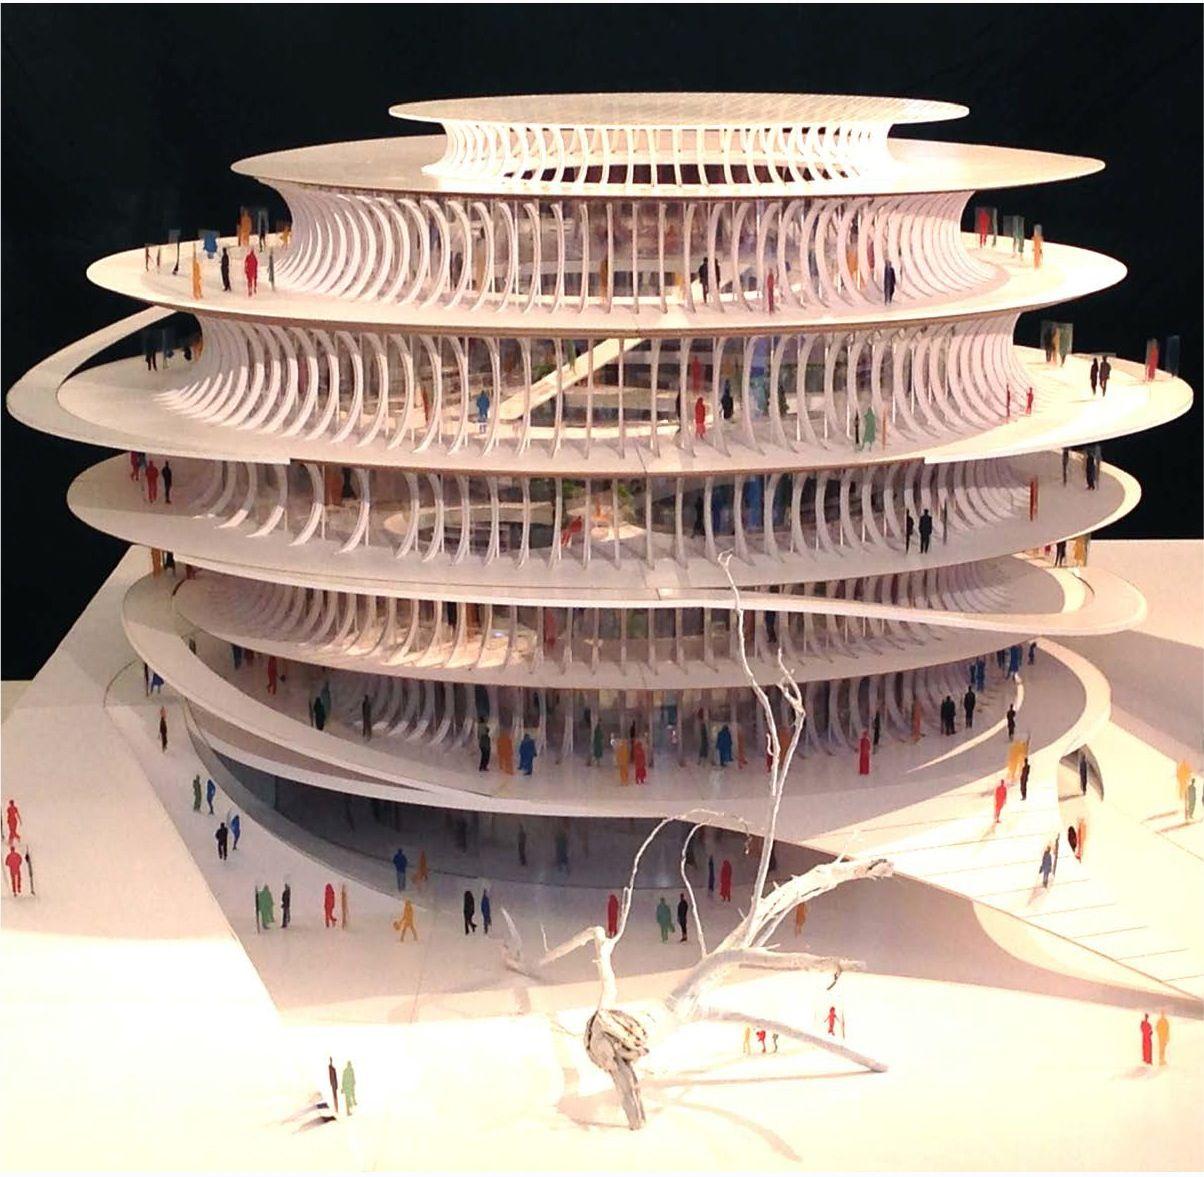 Afficher l 39 image d 39 origine architectural models for Origine architecture